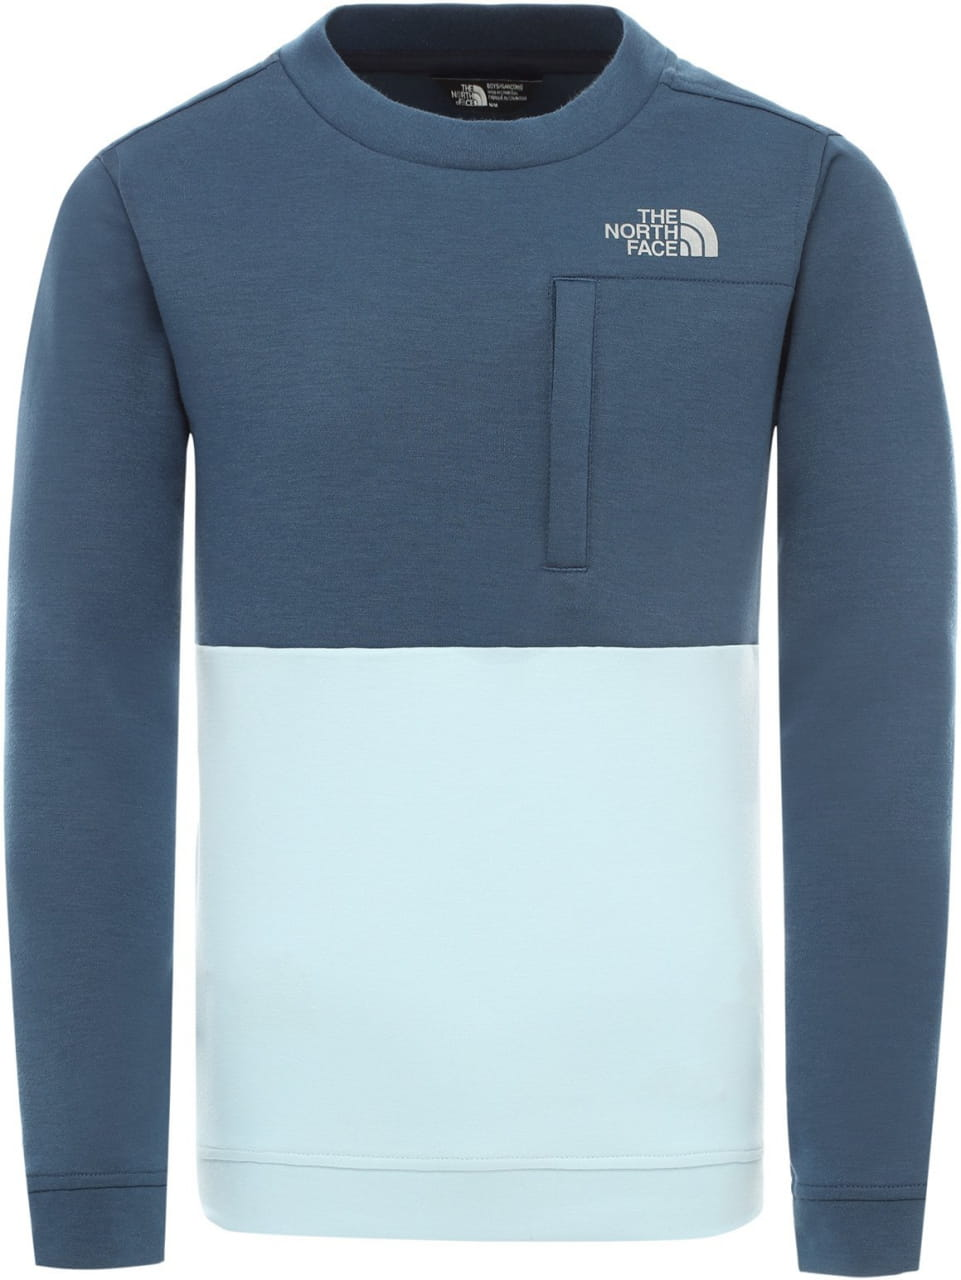 Sweatshirts The North Face Boys' Slacker Pullover